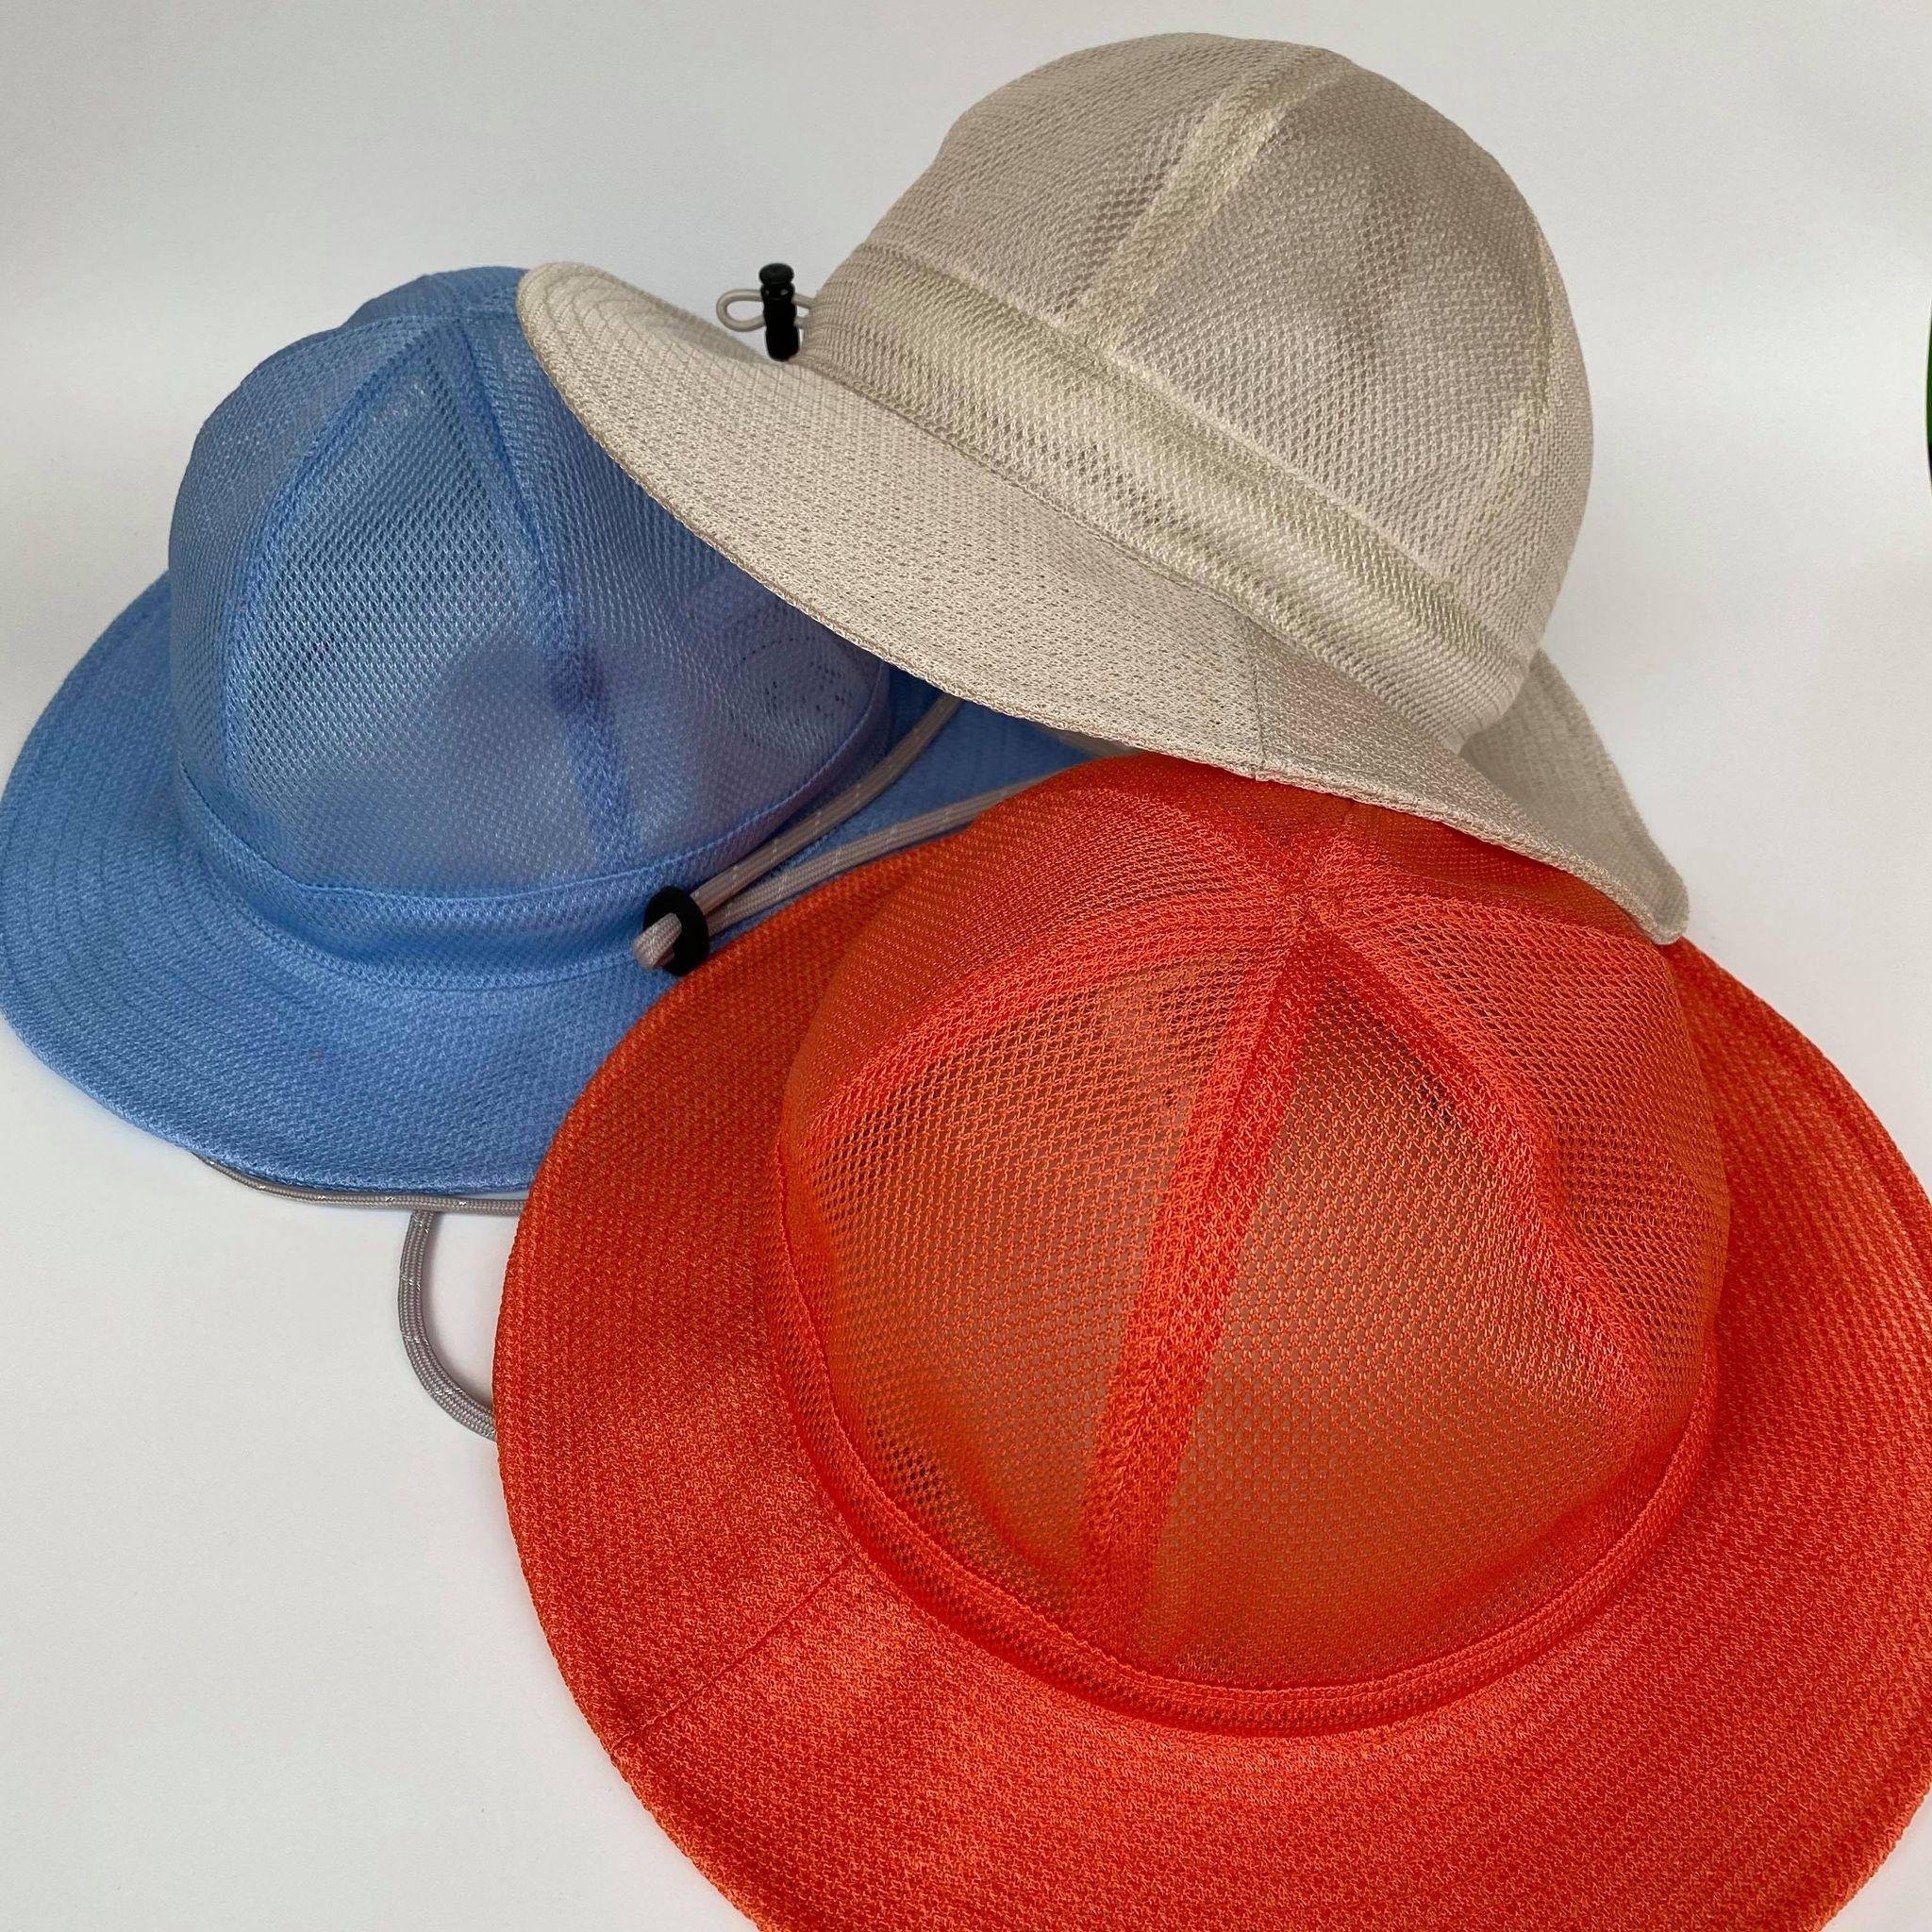 【MOUNTEN.】21S-MA20-0949 mesh adventure hat